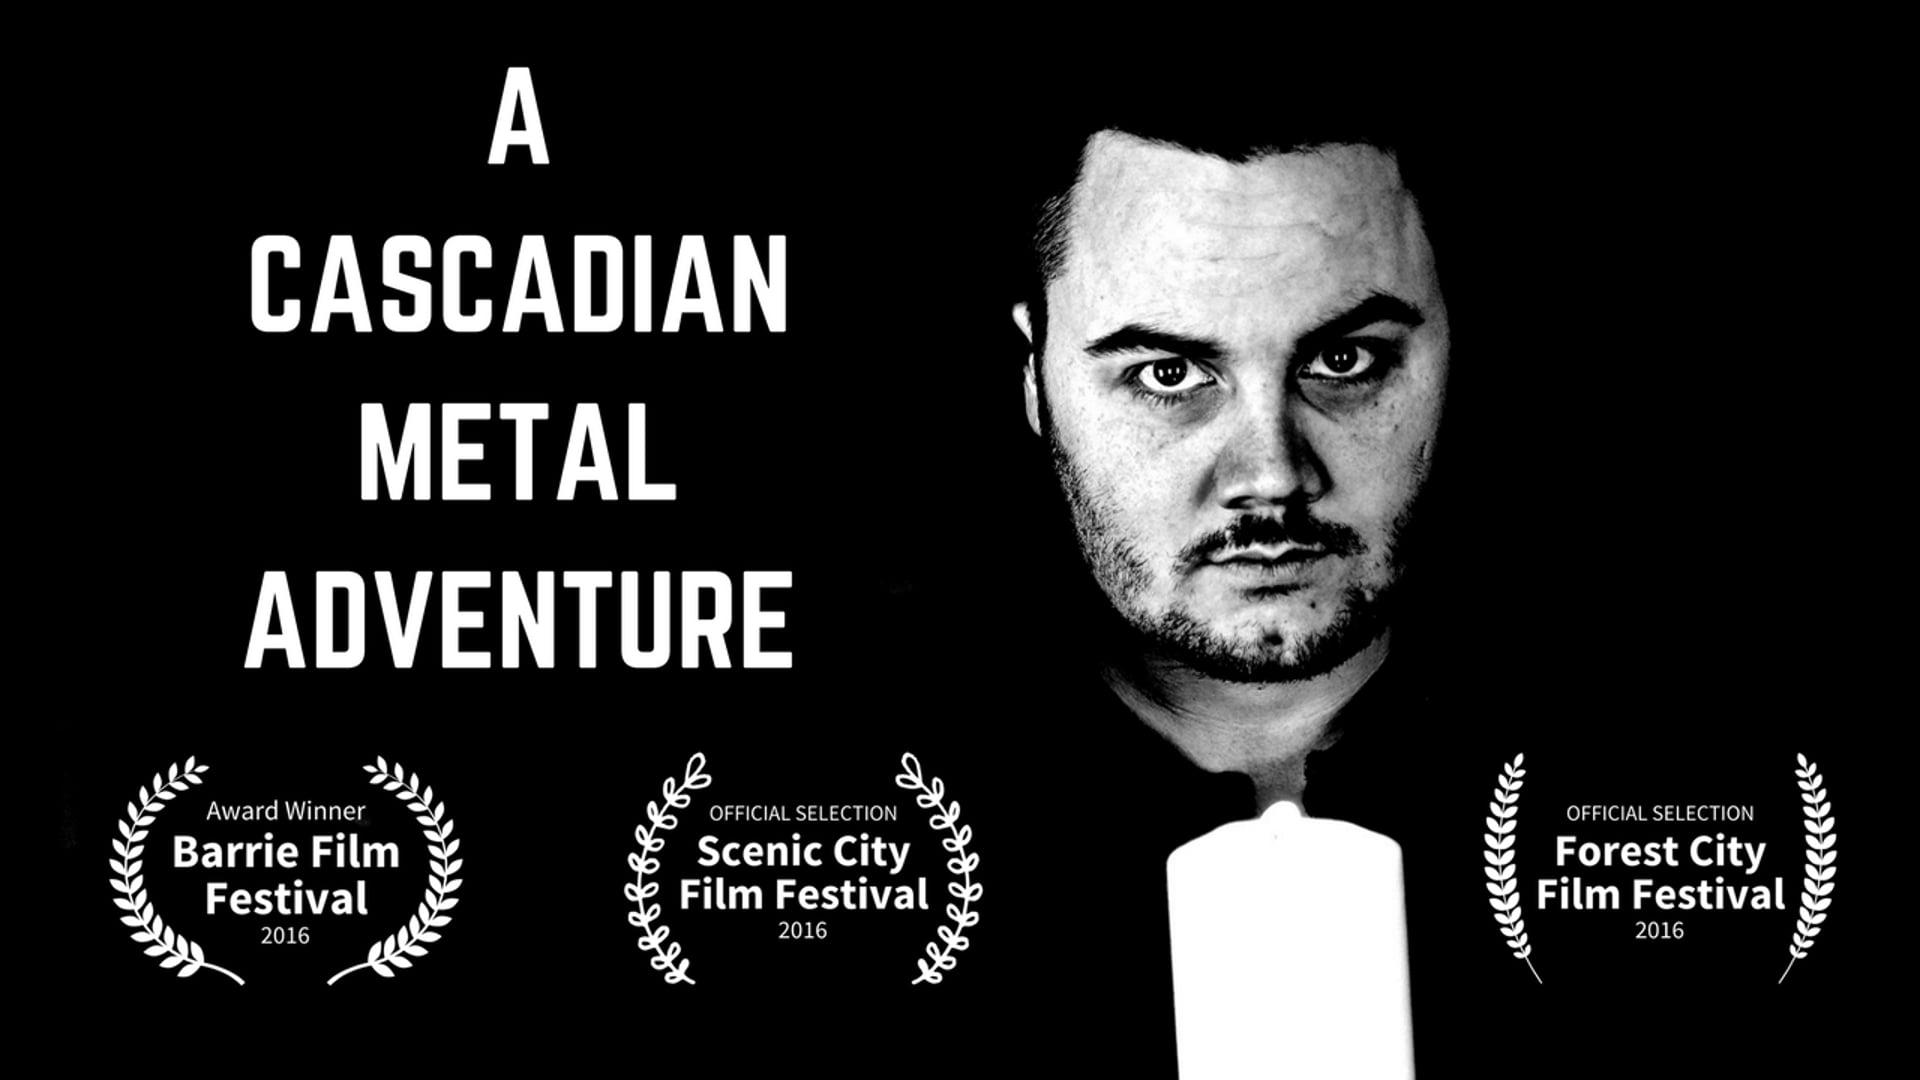 A Cascadian Metal Adventure